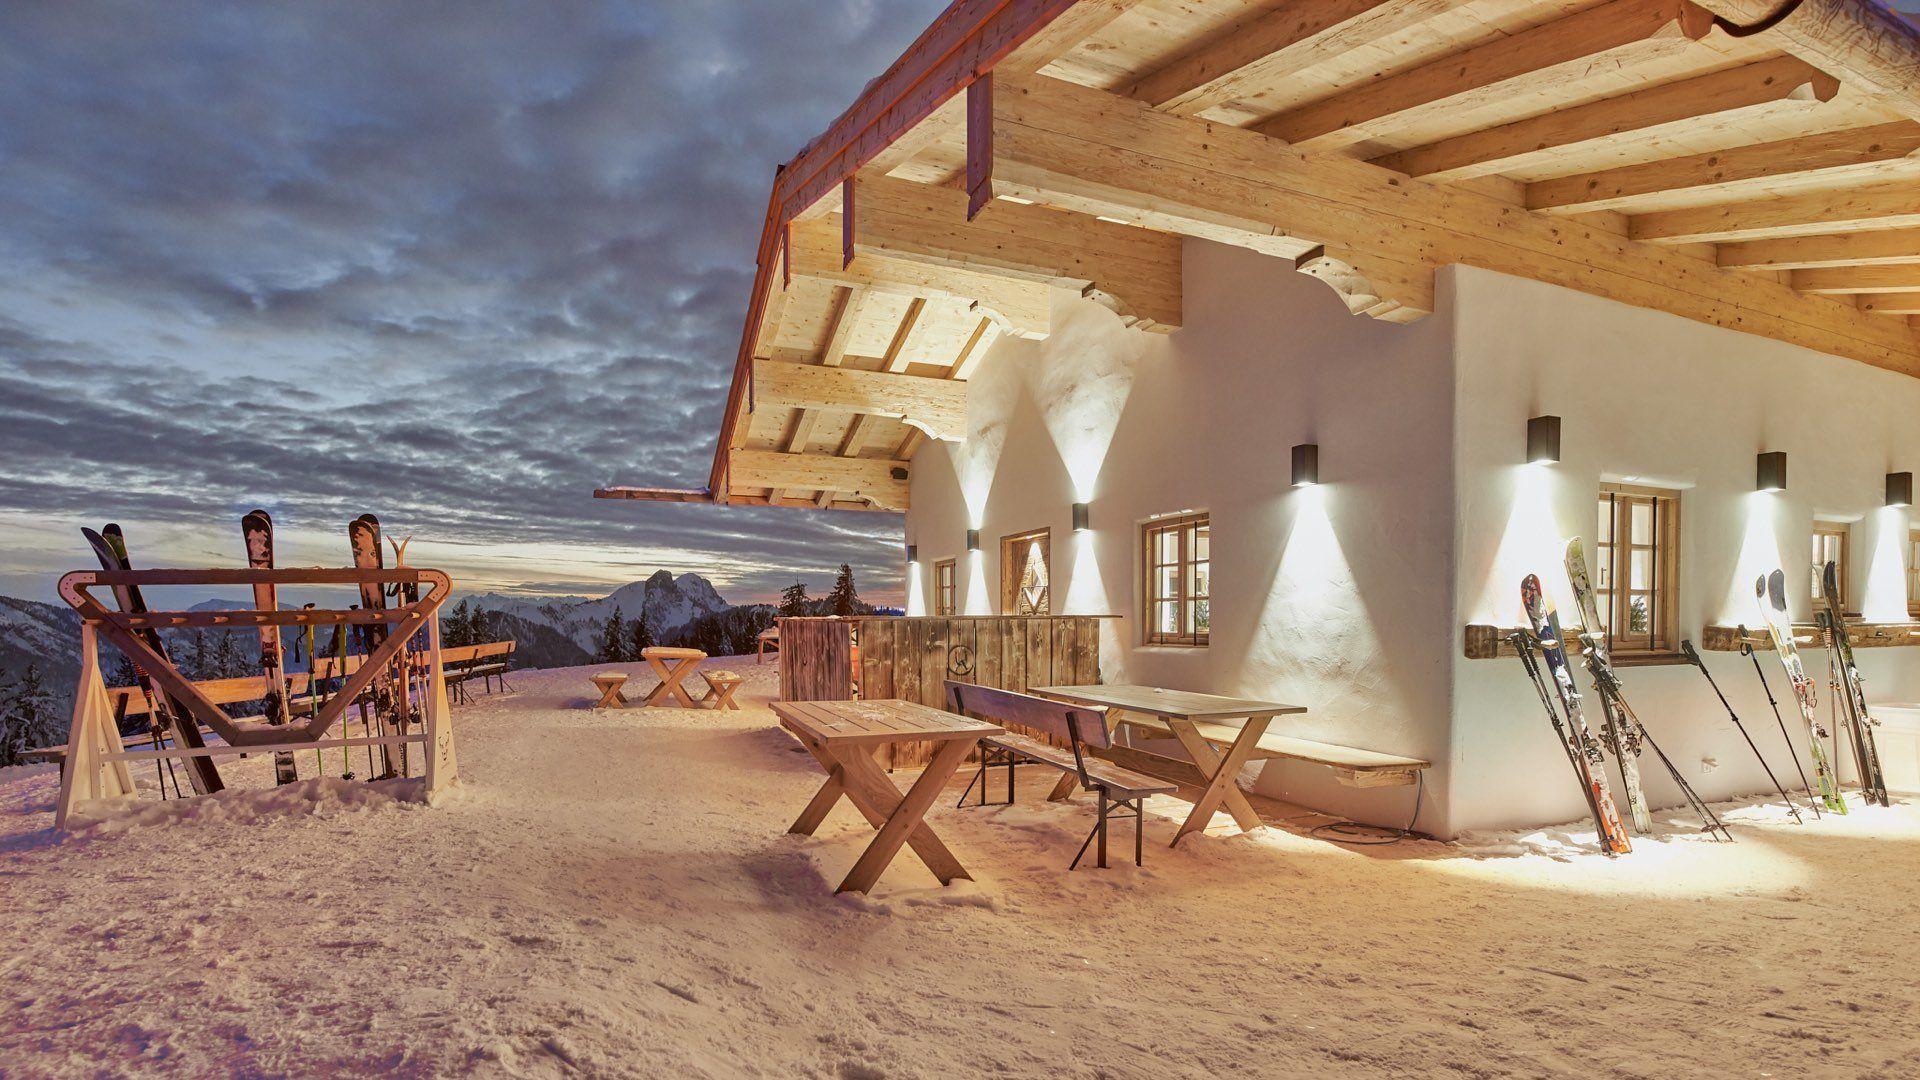 Aussenbeleuchtung und Lichtplanung einer Berghütte, Ruhpolding